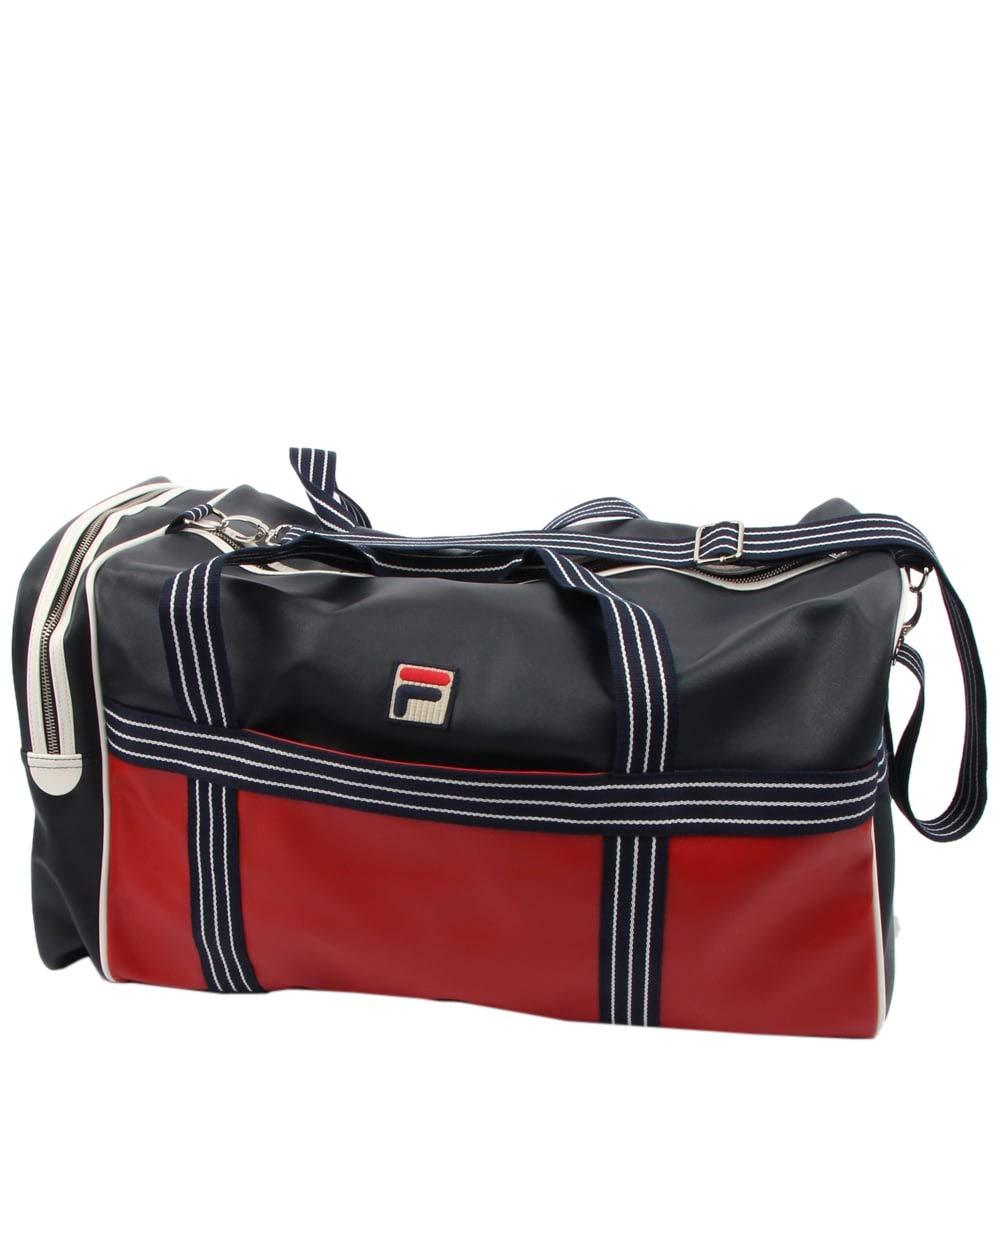 Fila Landon Holdall Bag (Peacoat/Chinese Red-White, One_Size)